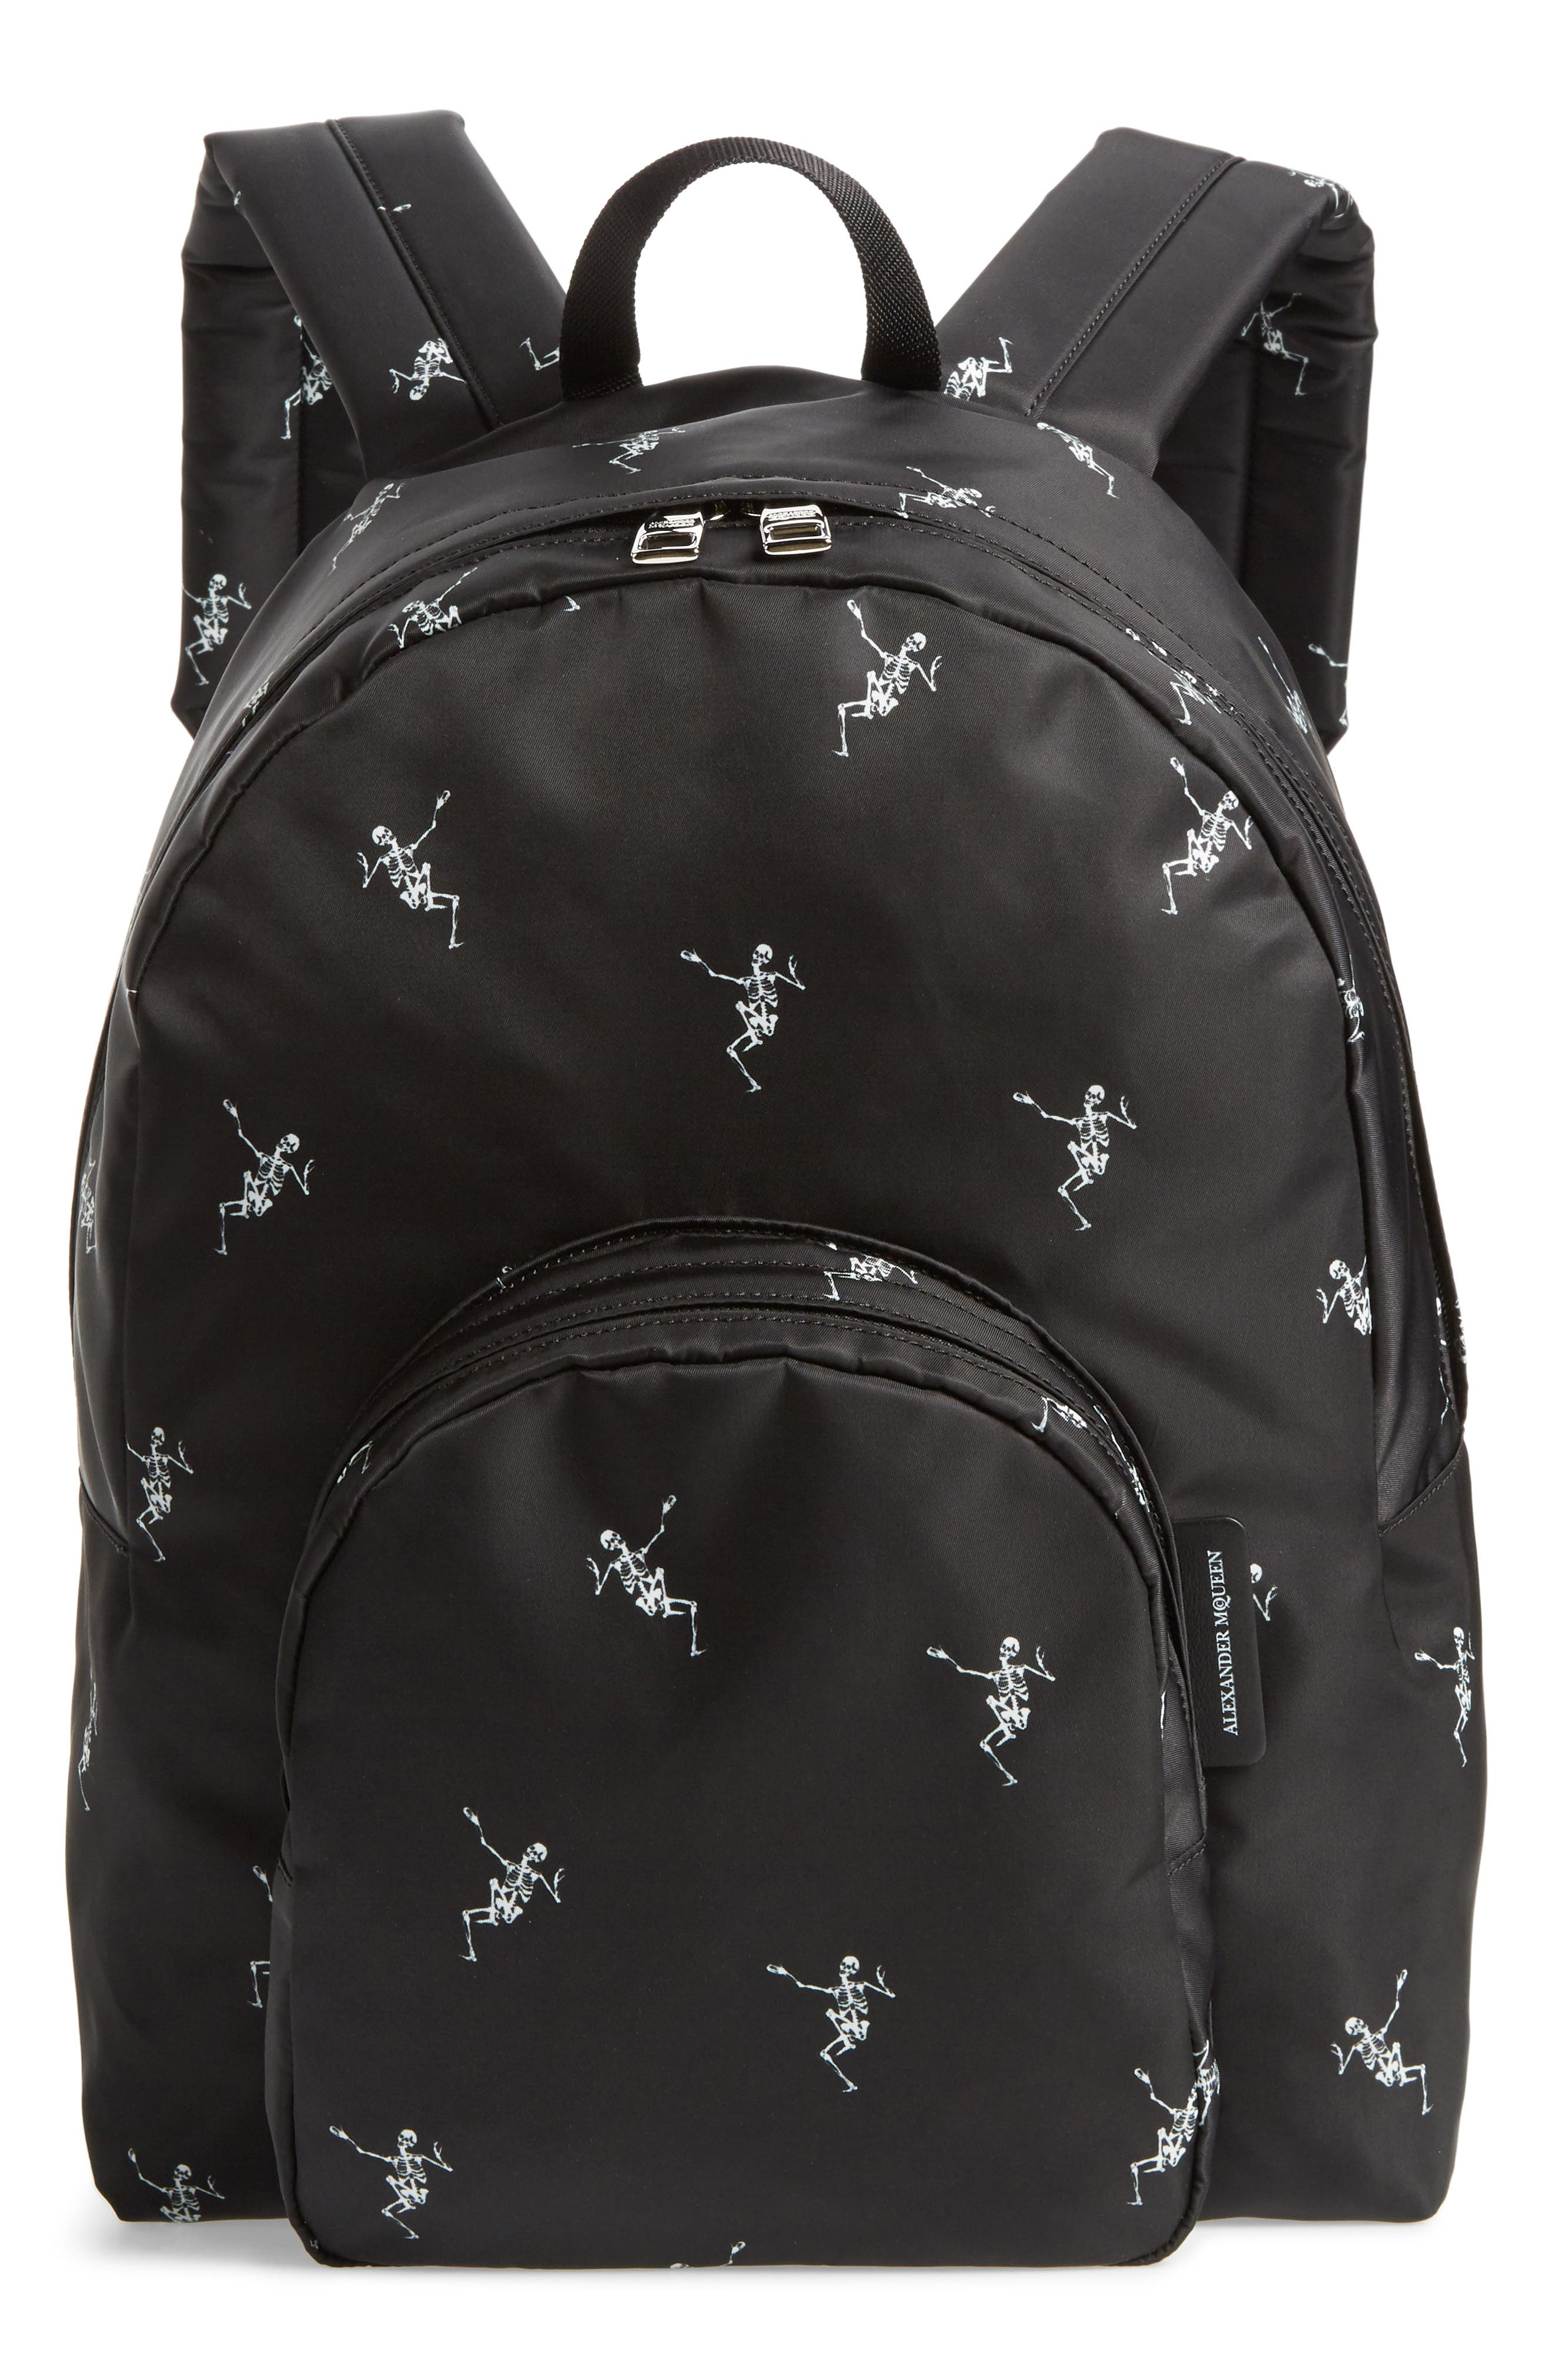 Dancing Skeleton Backpack,                             Main thumbnail 1, color,                             BLACK/ OFF WHITE